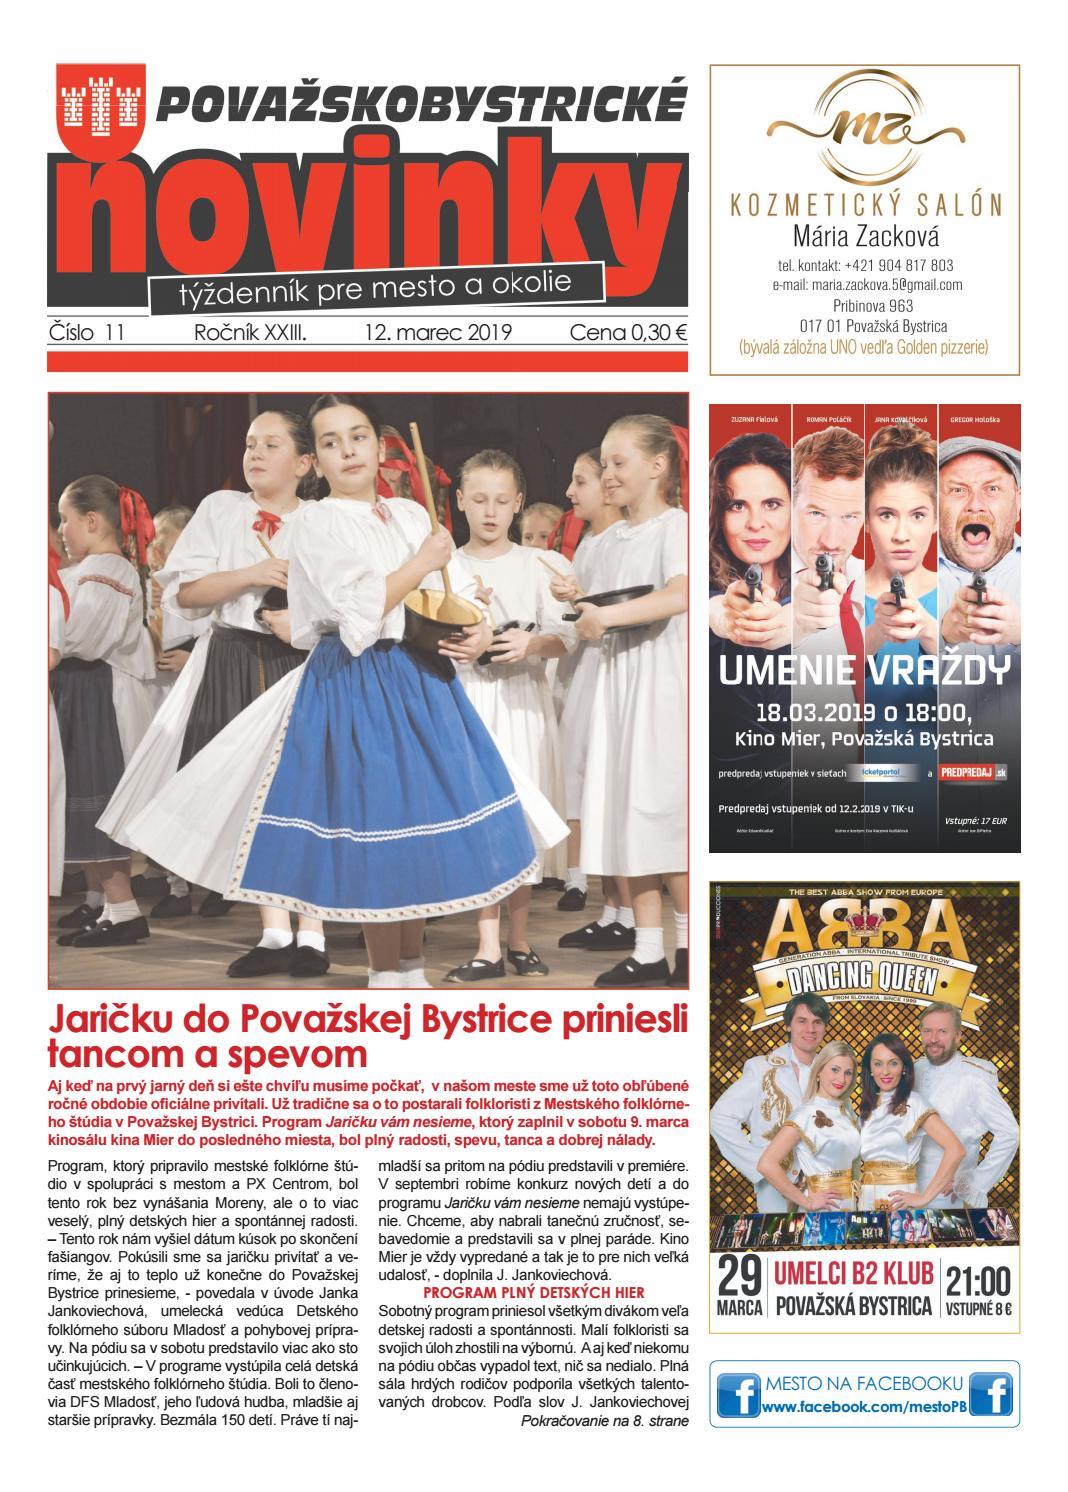 2e0624fea34b5 Považskobystrické novinky č. 11/2019 by Považskobystrické novinky - issuu